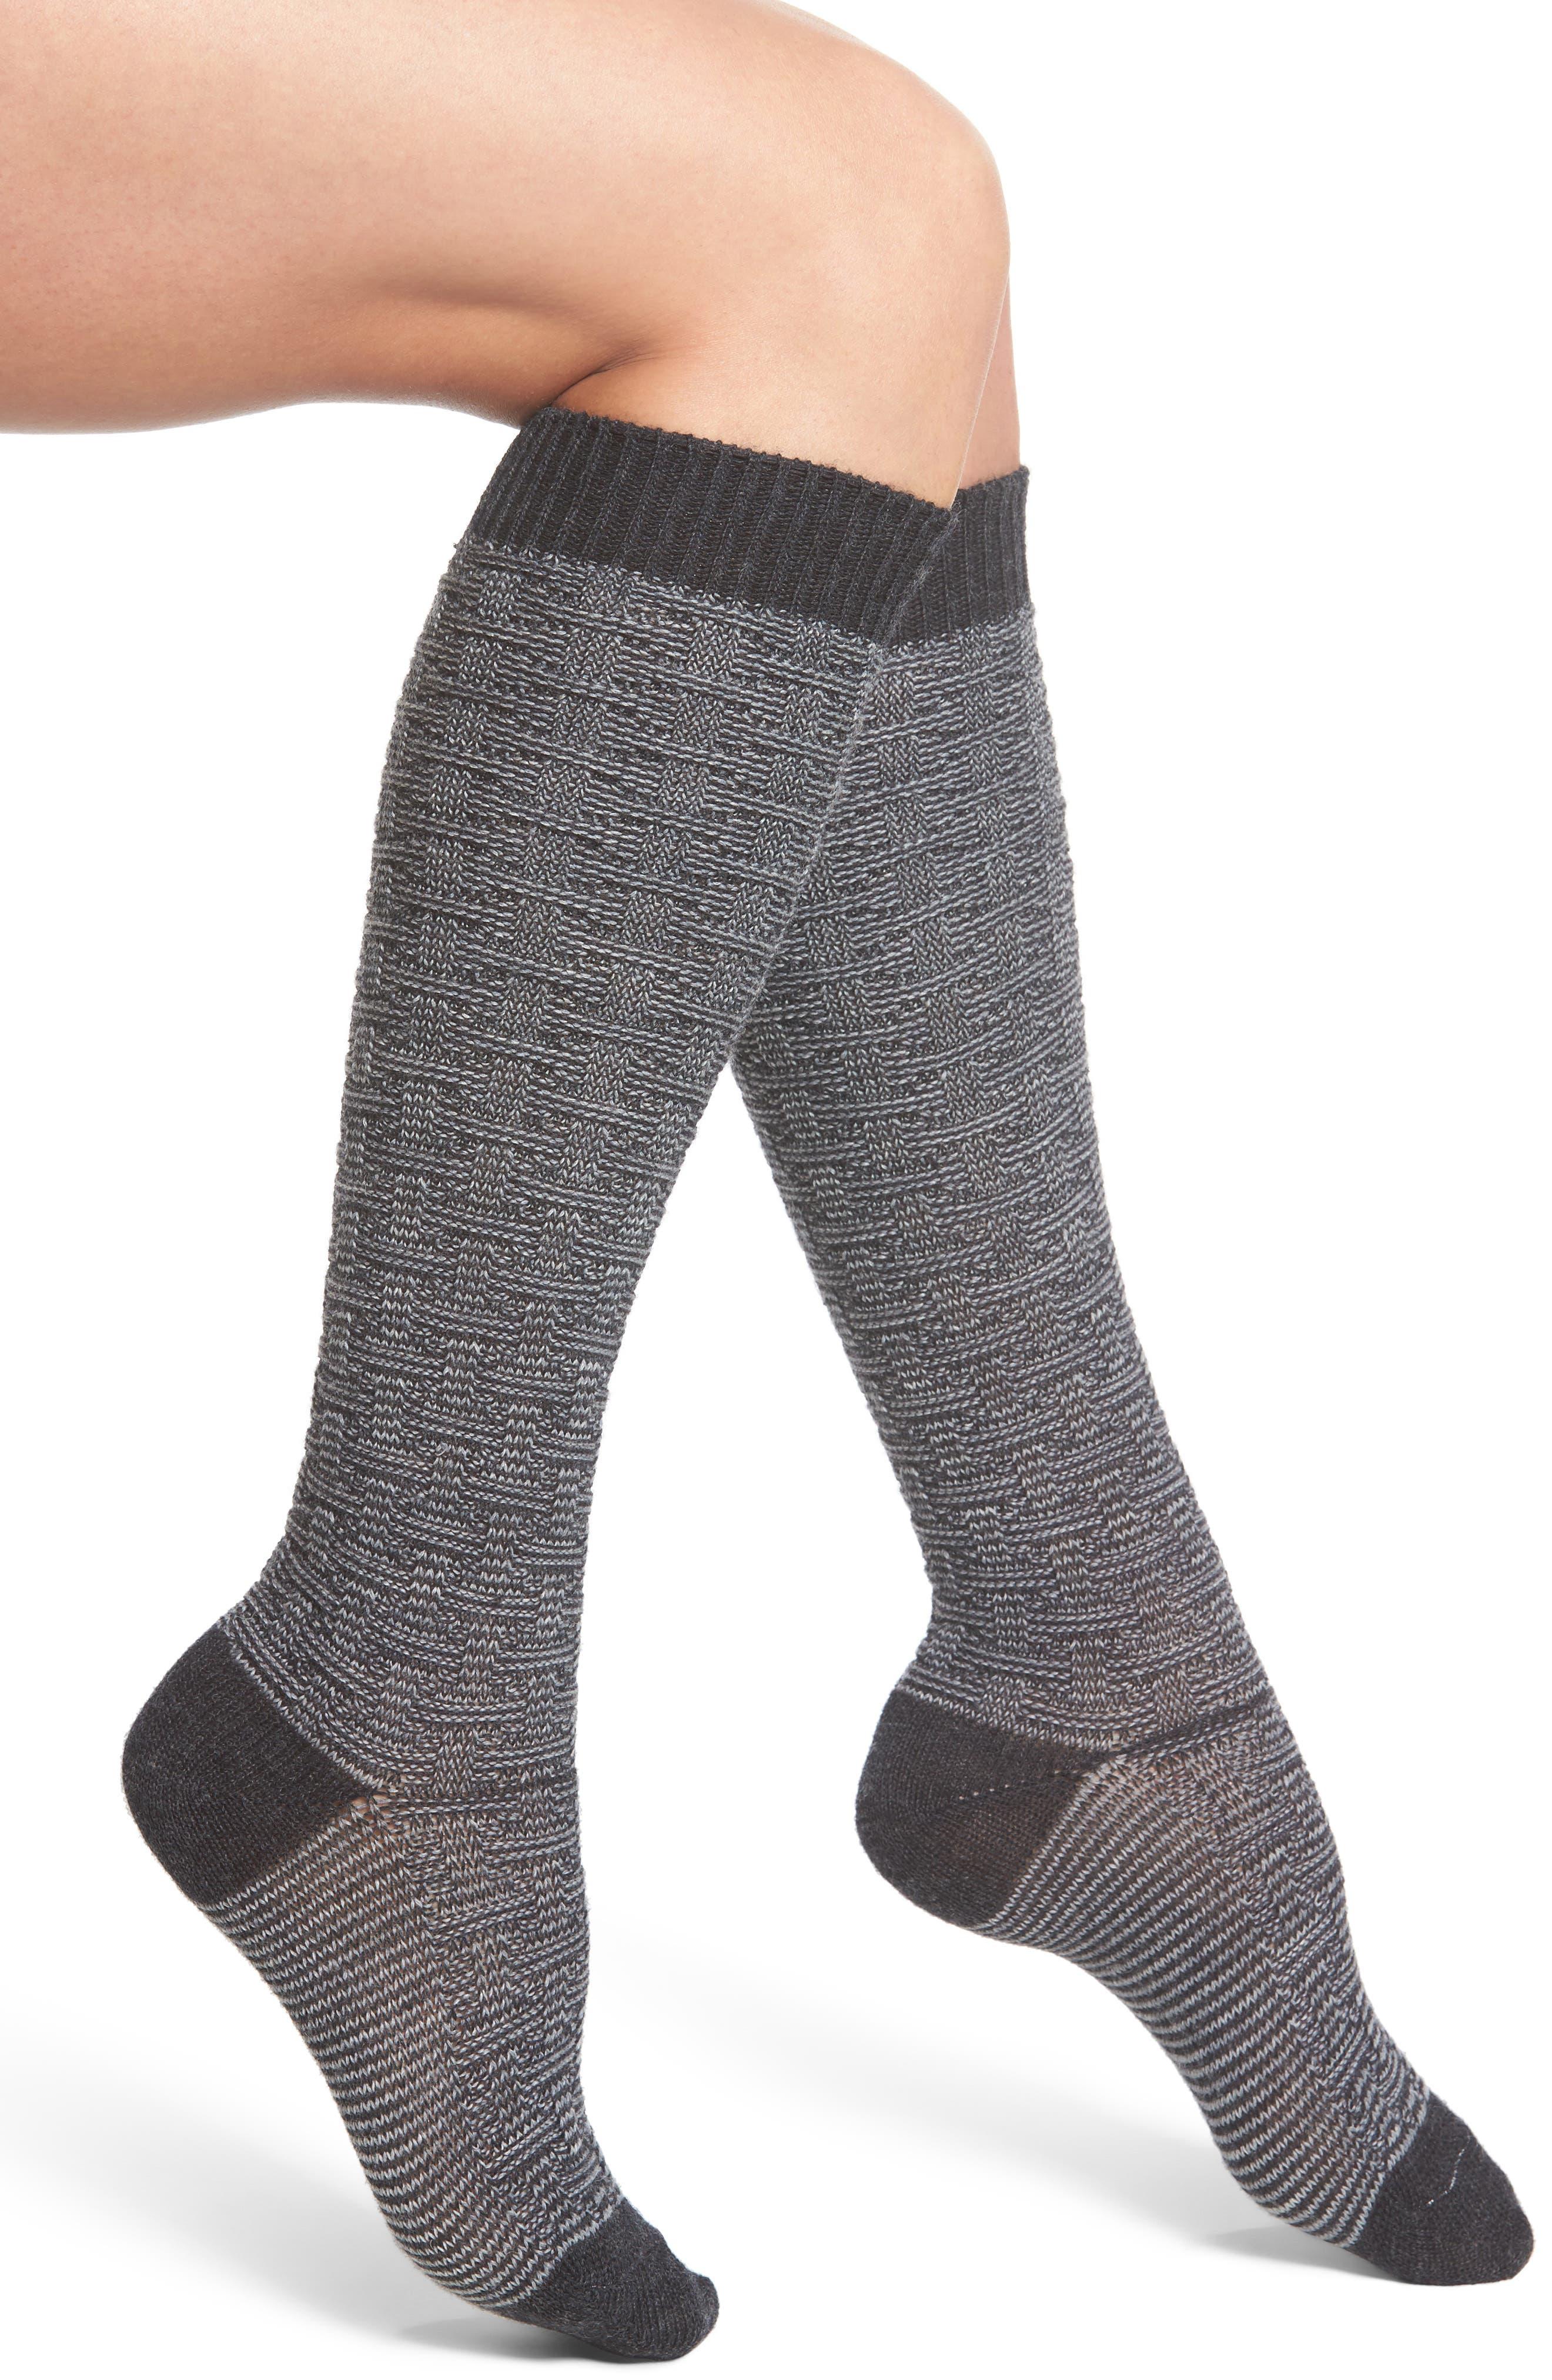 Ryn Knee High Socks,                         Main,                         color, Oxford